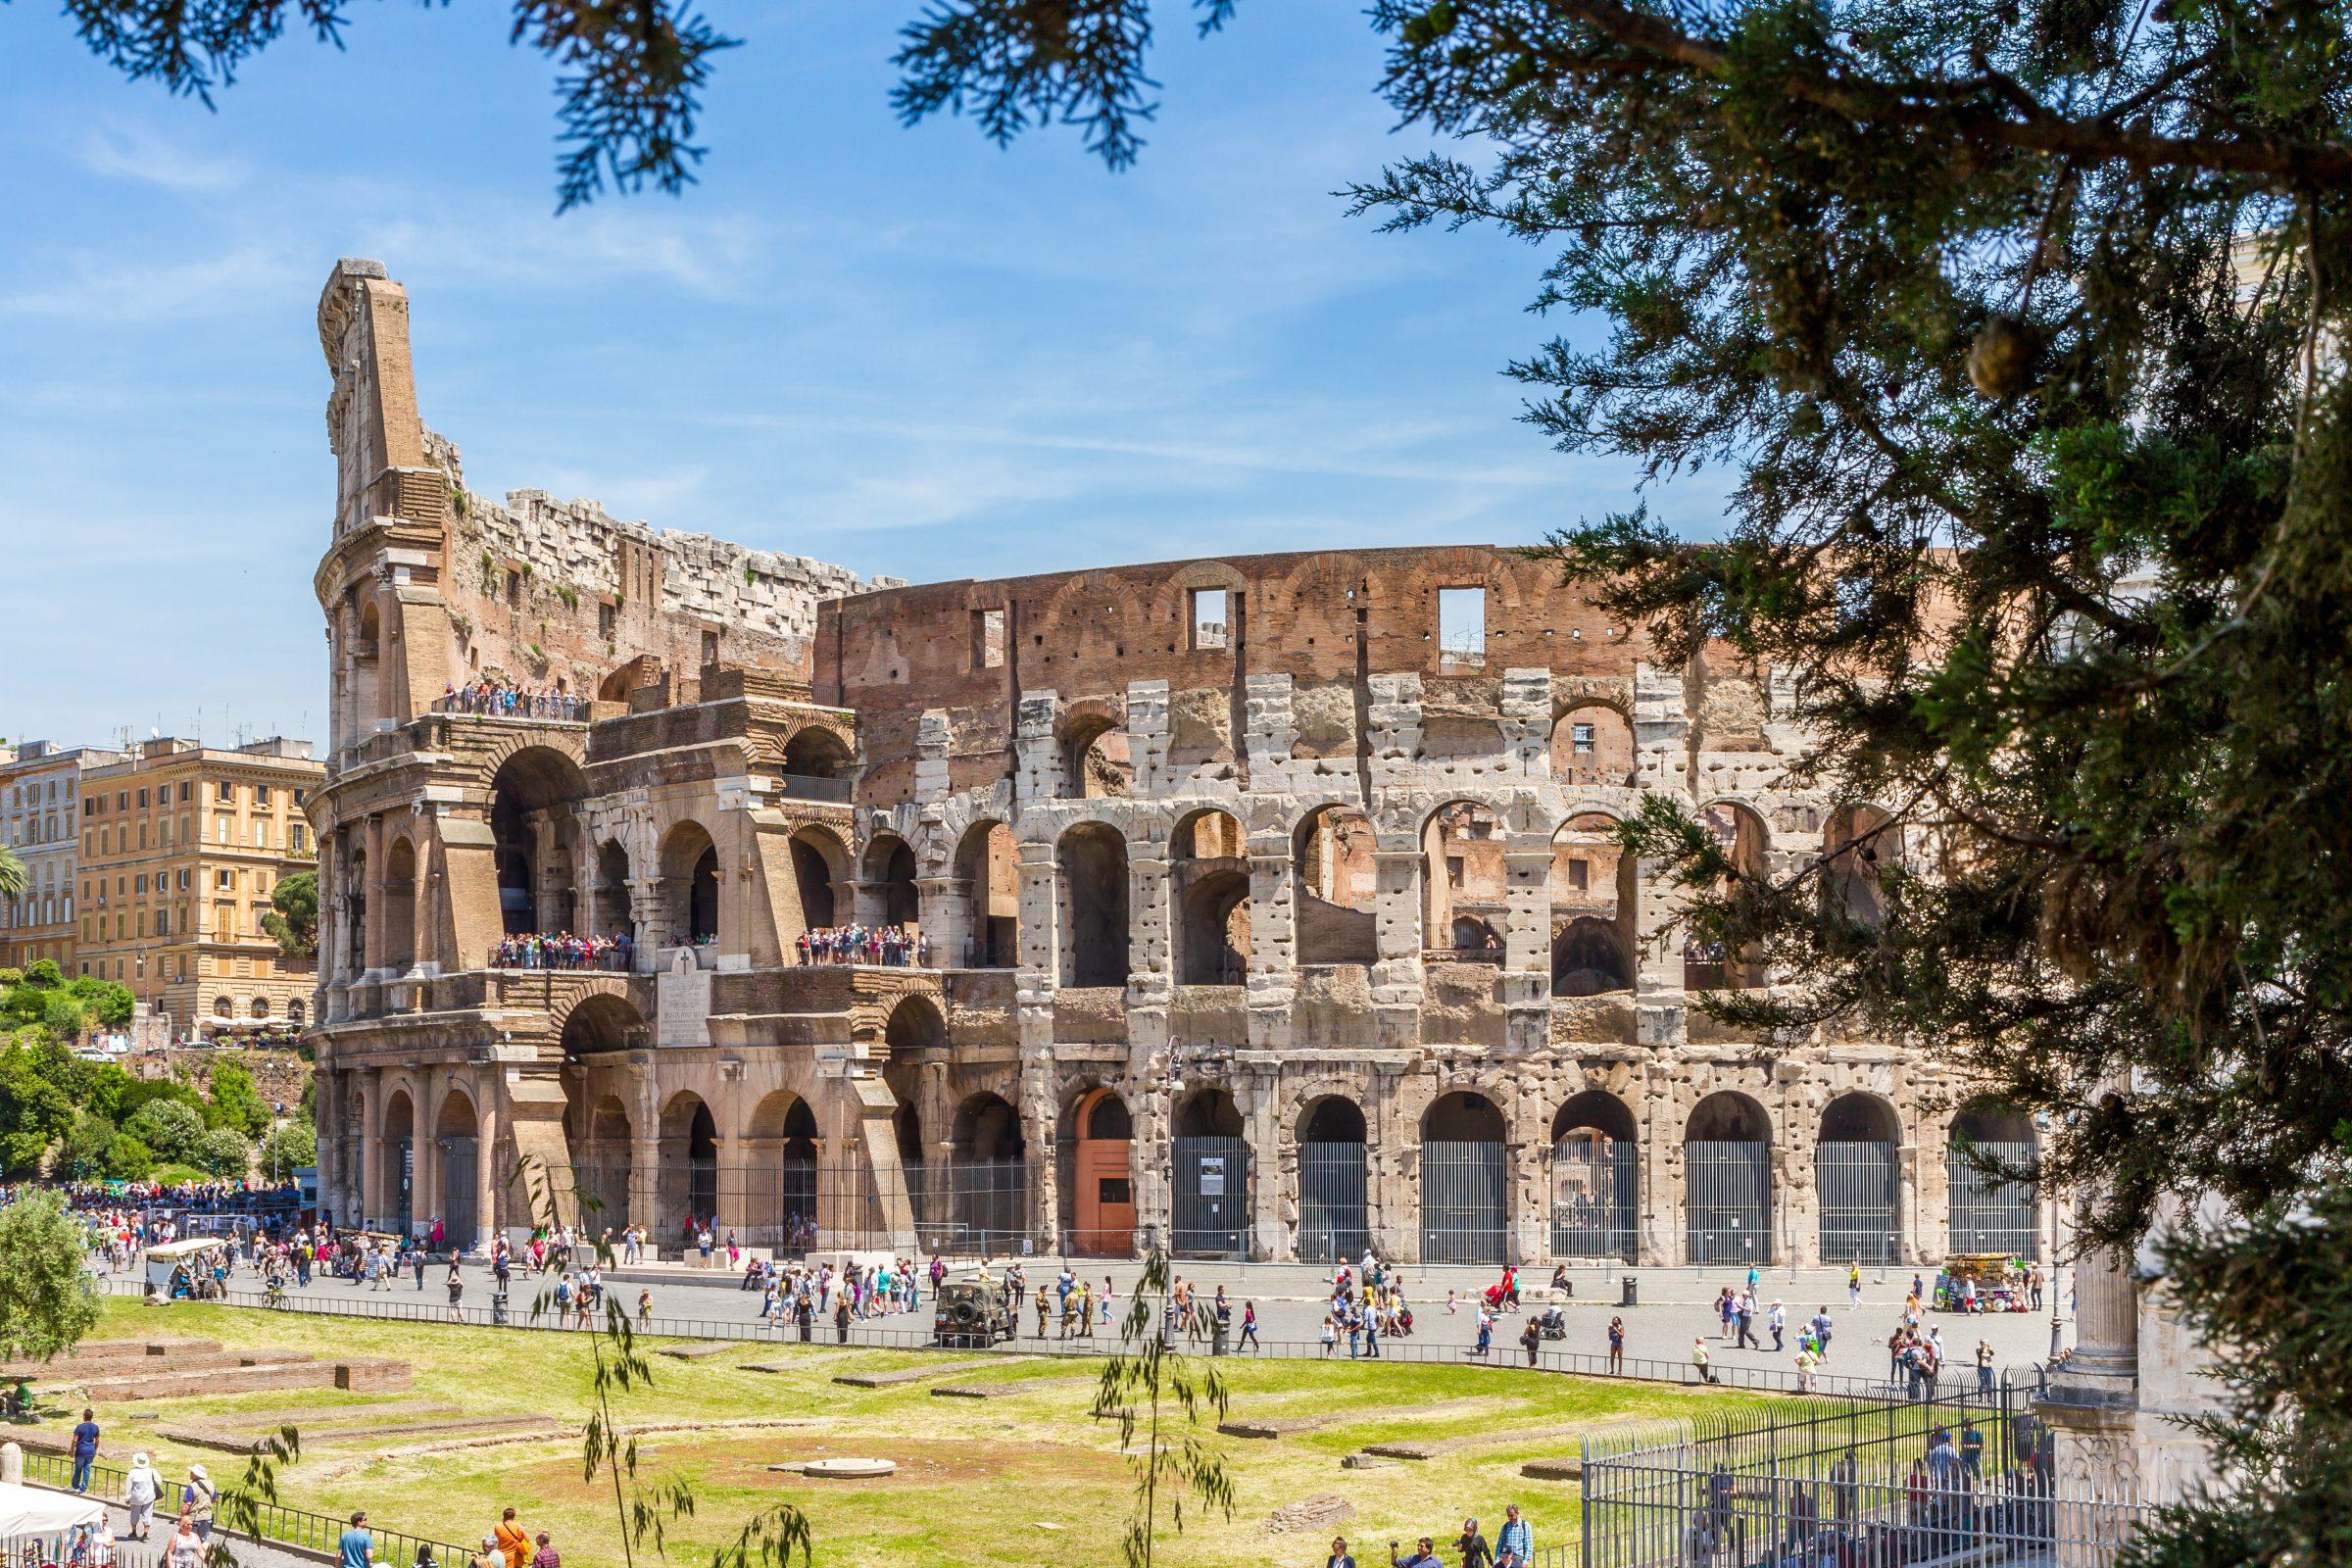 Wereldwonder Colosseum